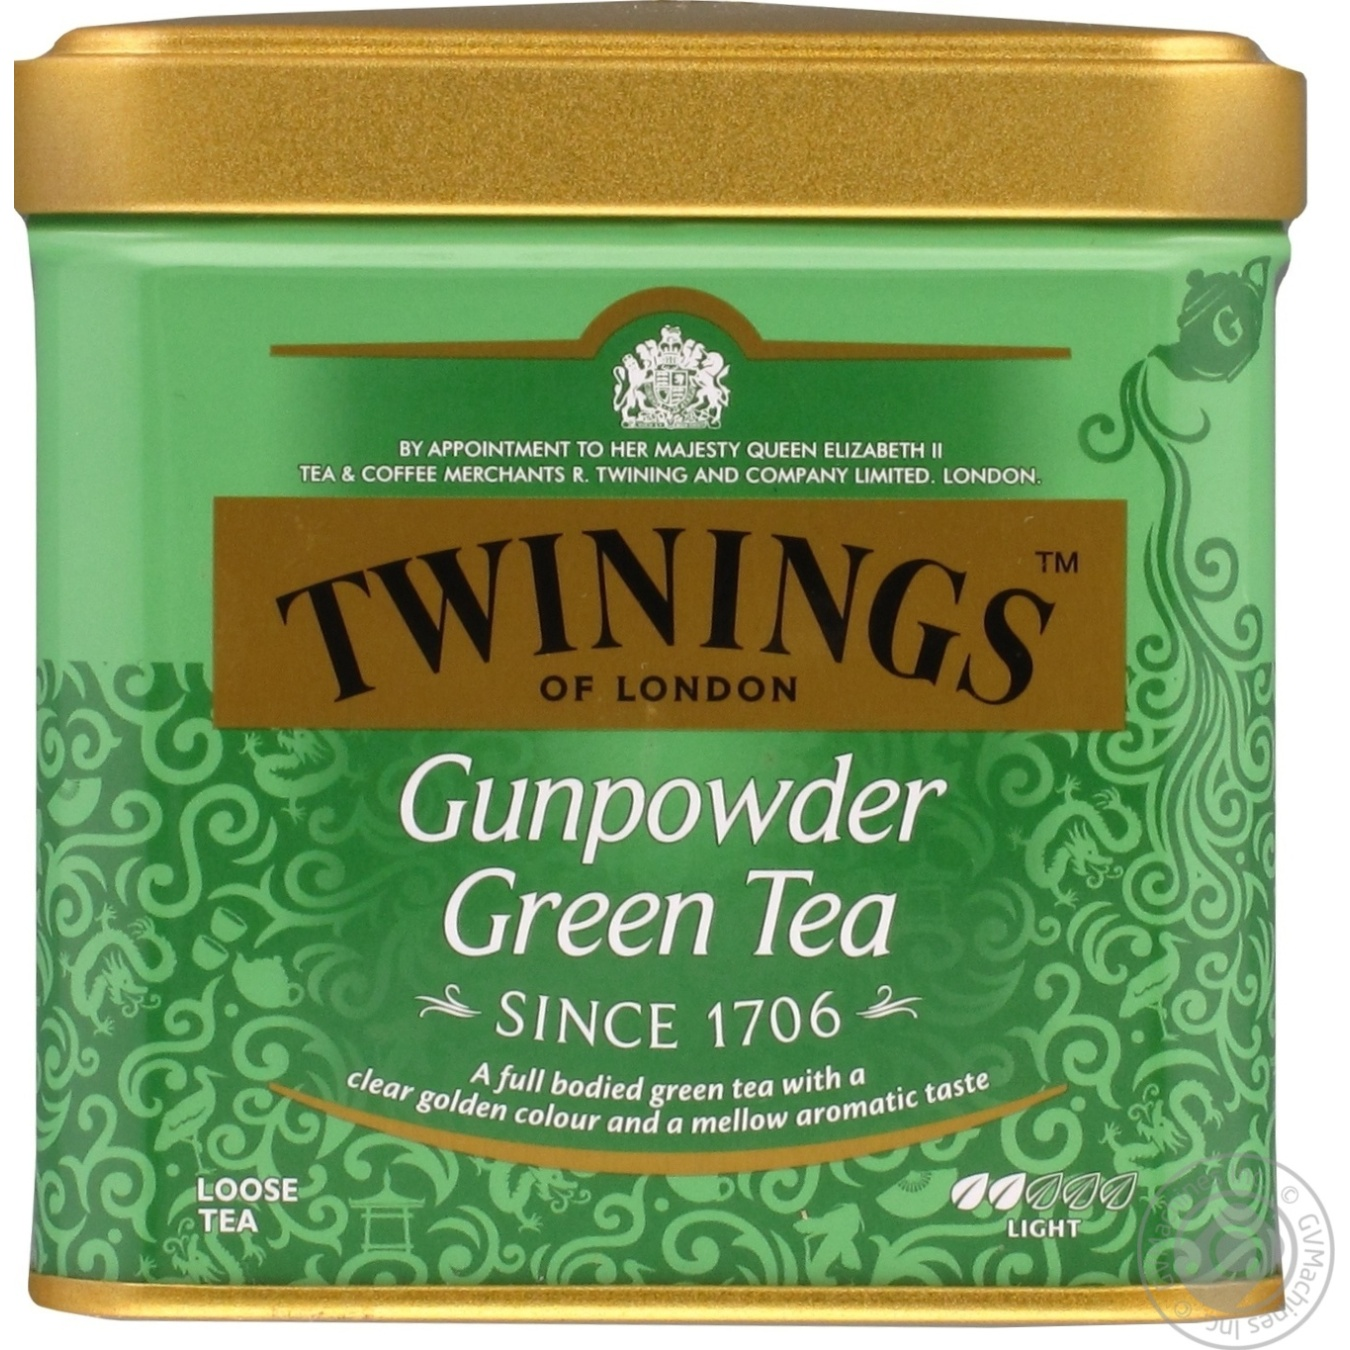 Купить Чай Twinings зеленый байховый ганпаудер 100г